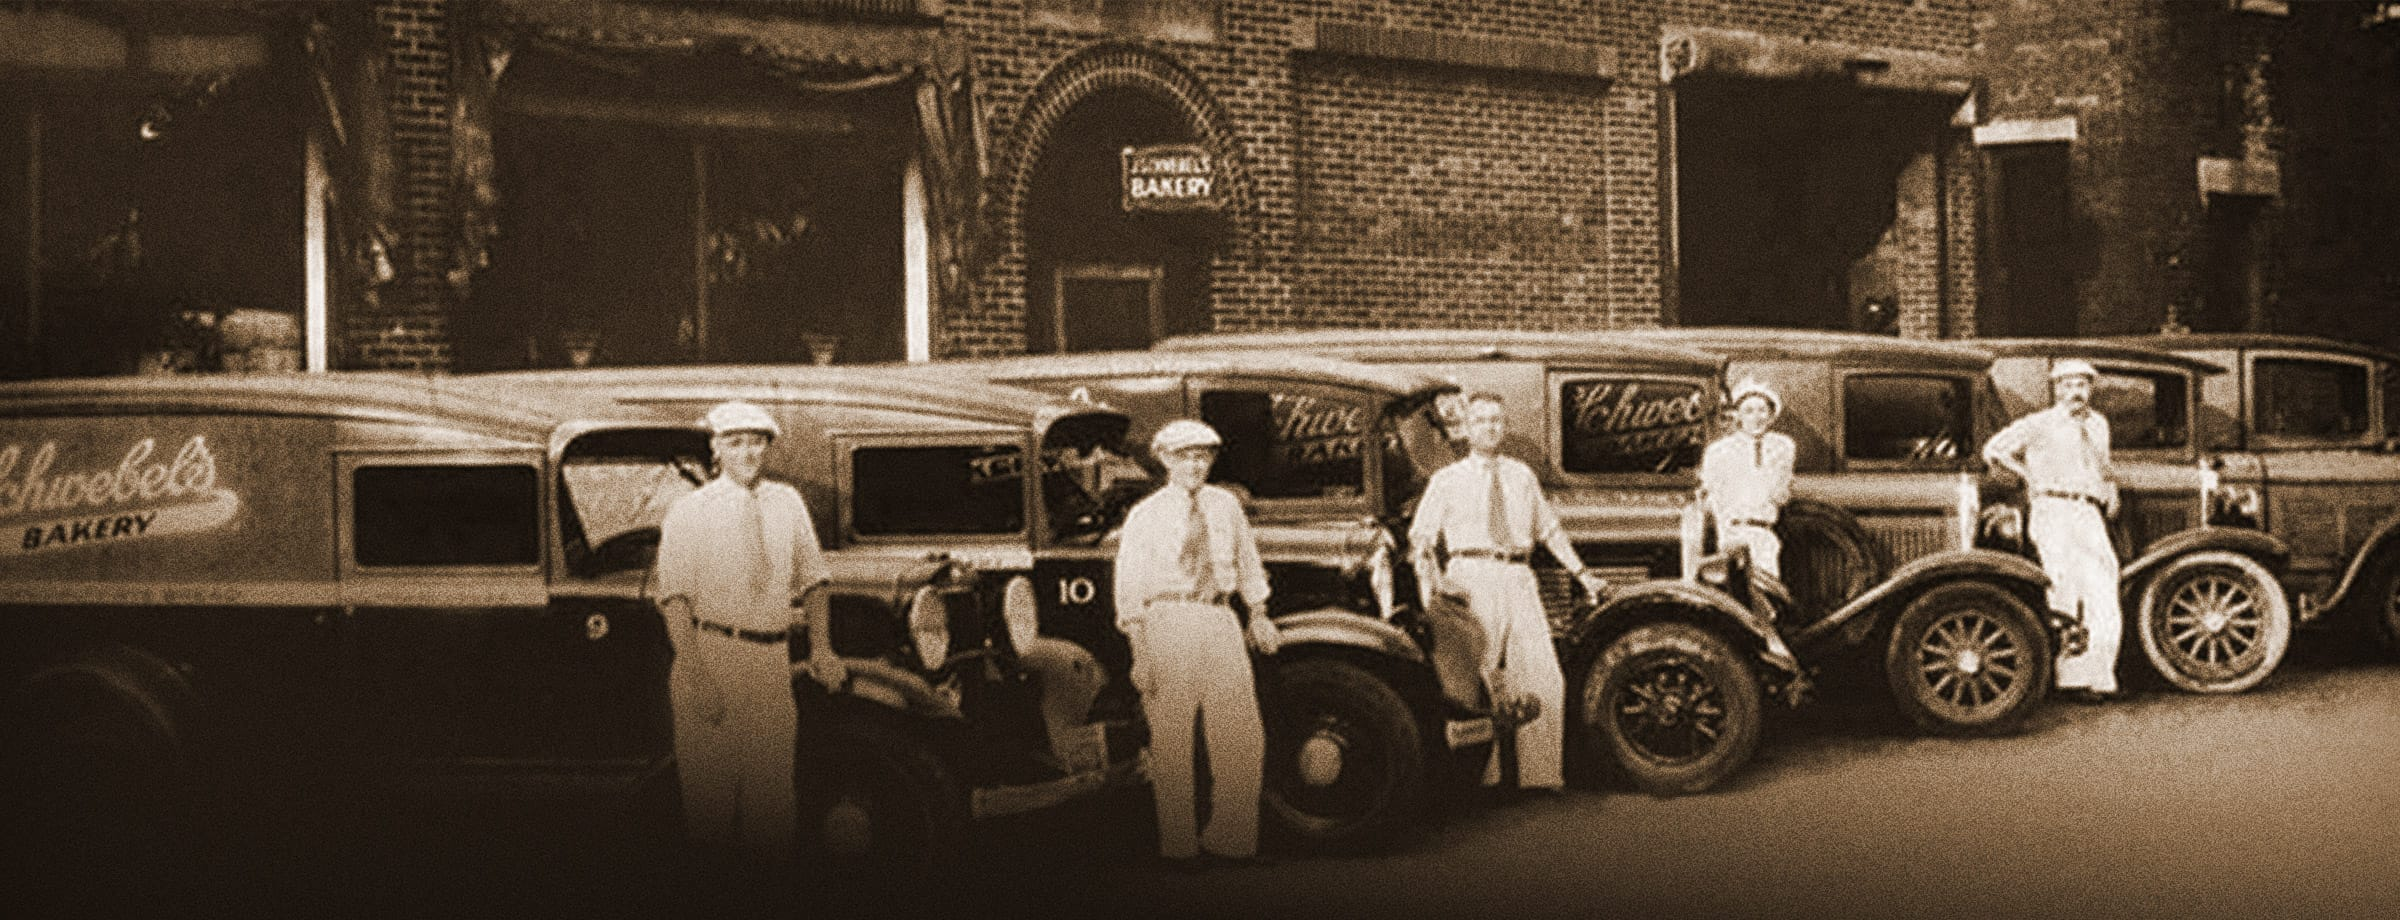 The Schwebel Baking Company